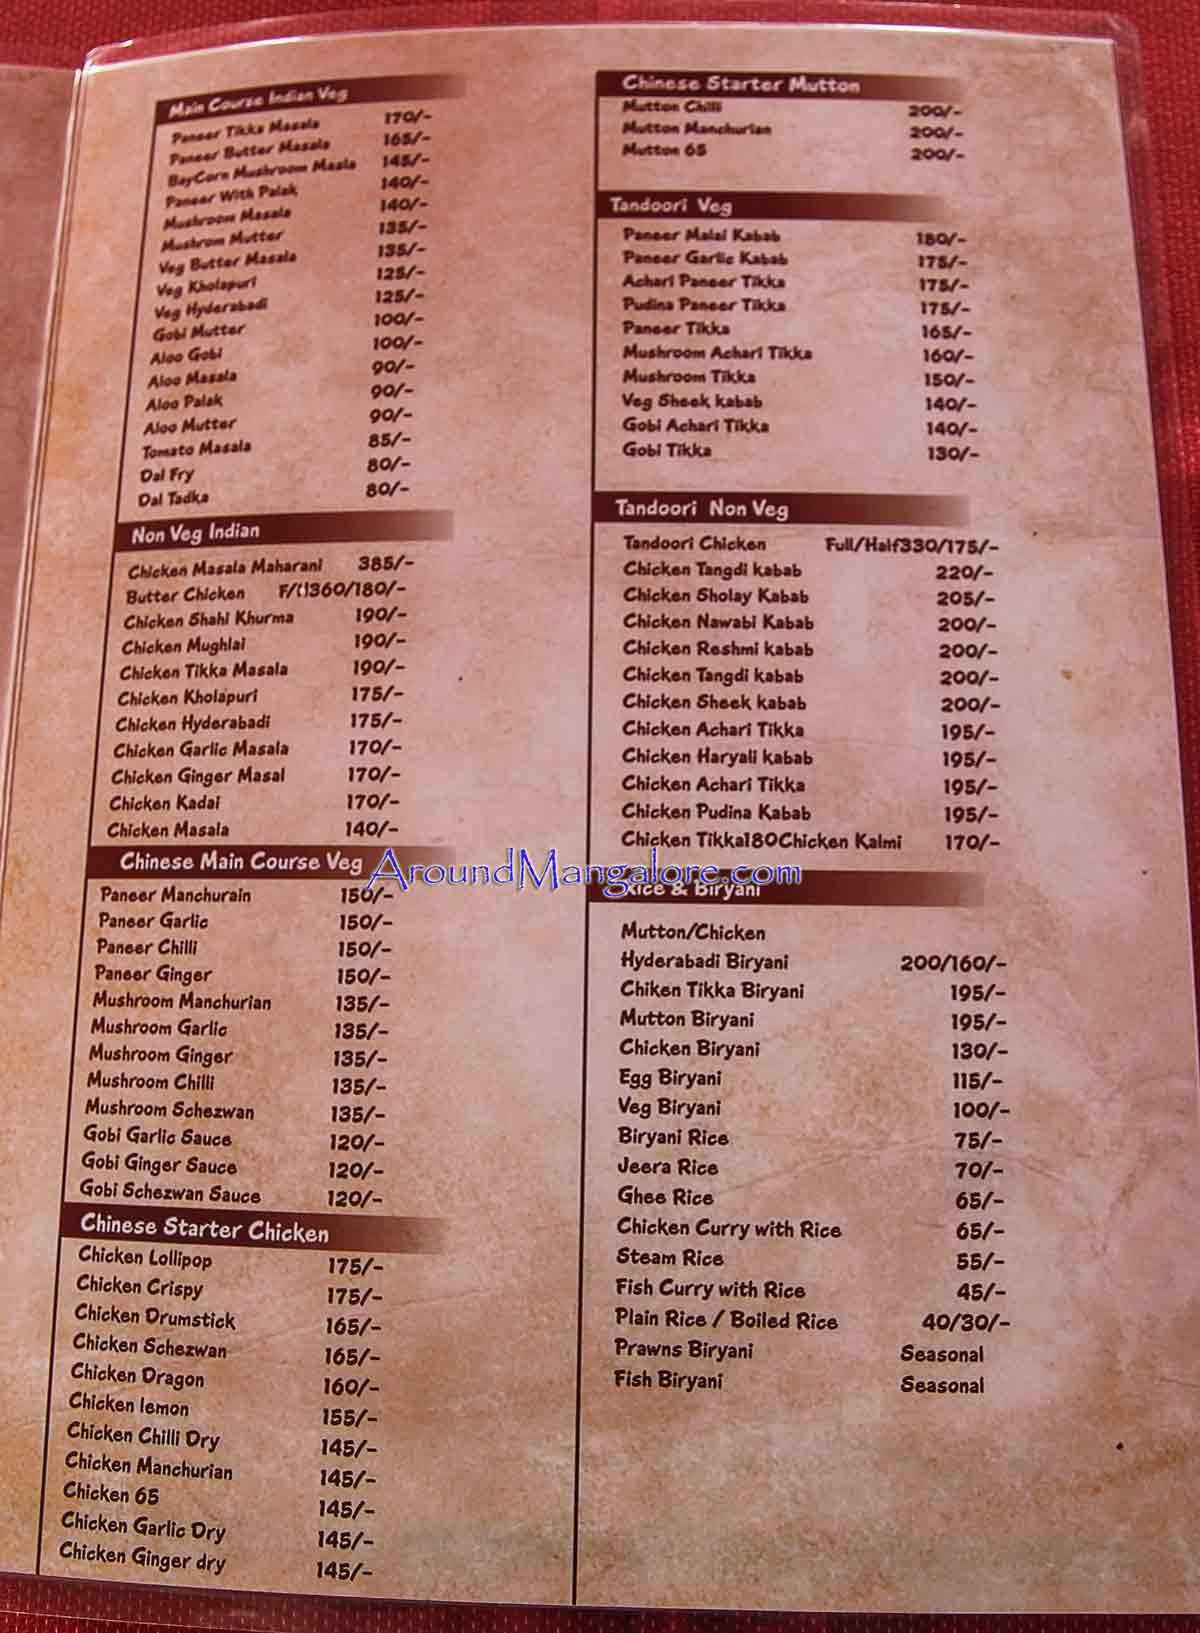 Food Menu Dolphin Restaurant Cocktail Bar Bejai P2 - Dolphin Family Restaurant & Cocktail Bar - Bejai